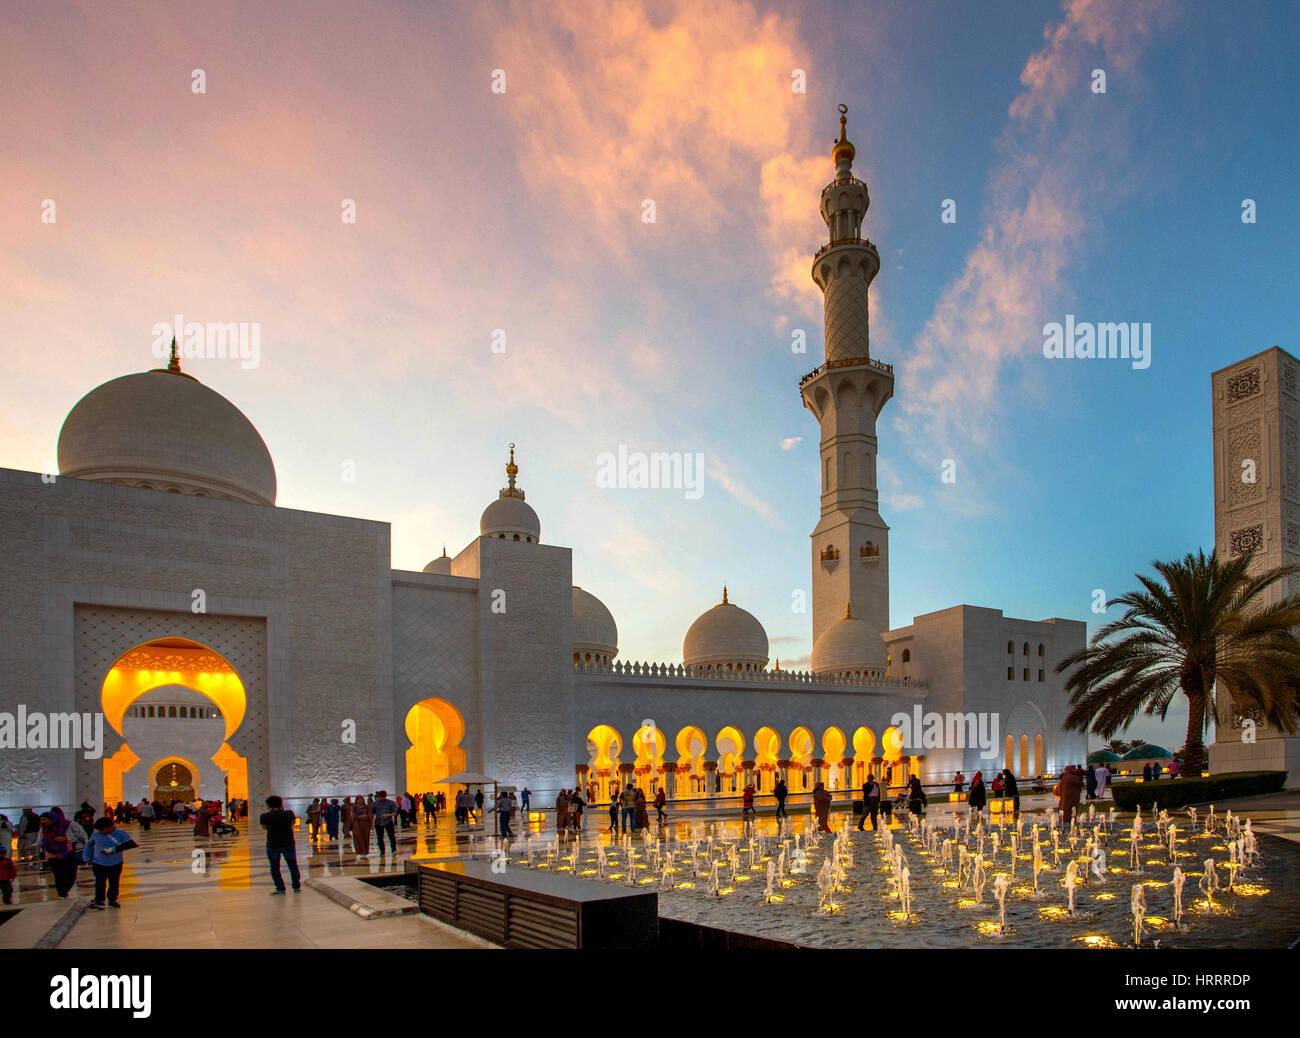 Gran Mezquita de Sheikh Zayed, en Abu Dhabi, Emiratos Árabes Unidos. Imagen De Stock